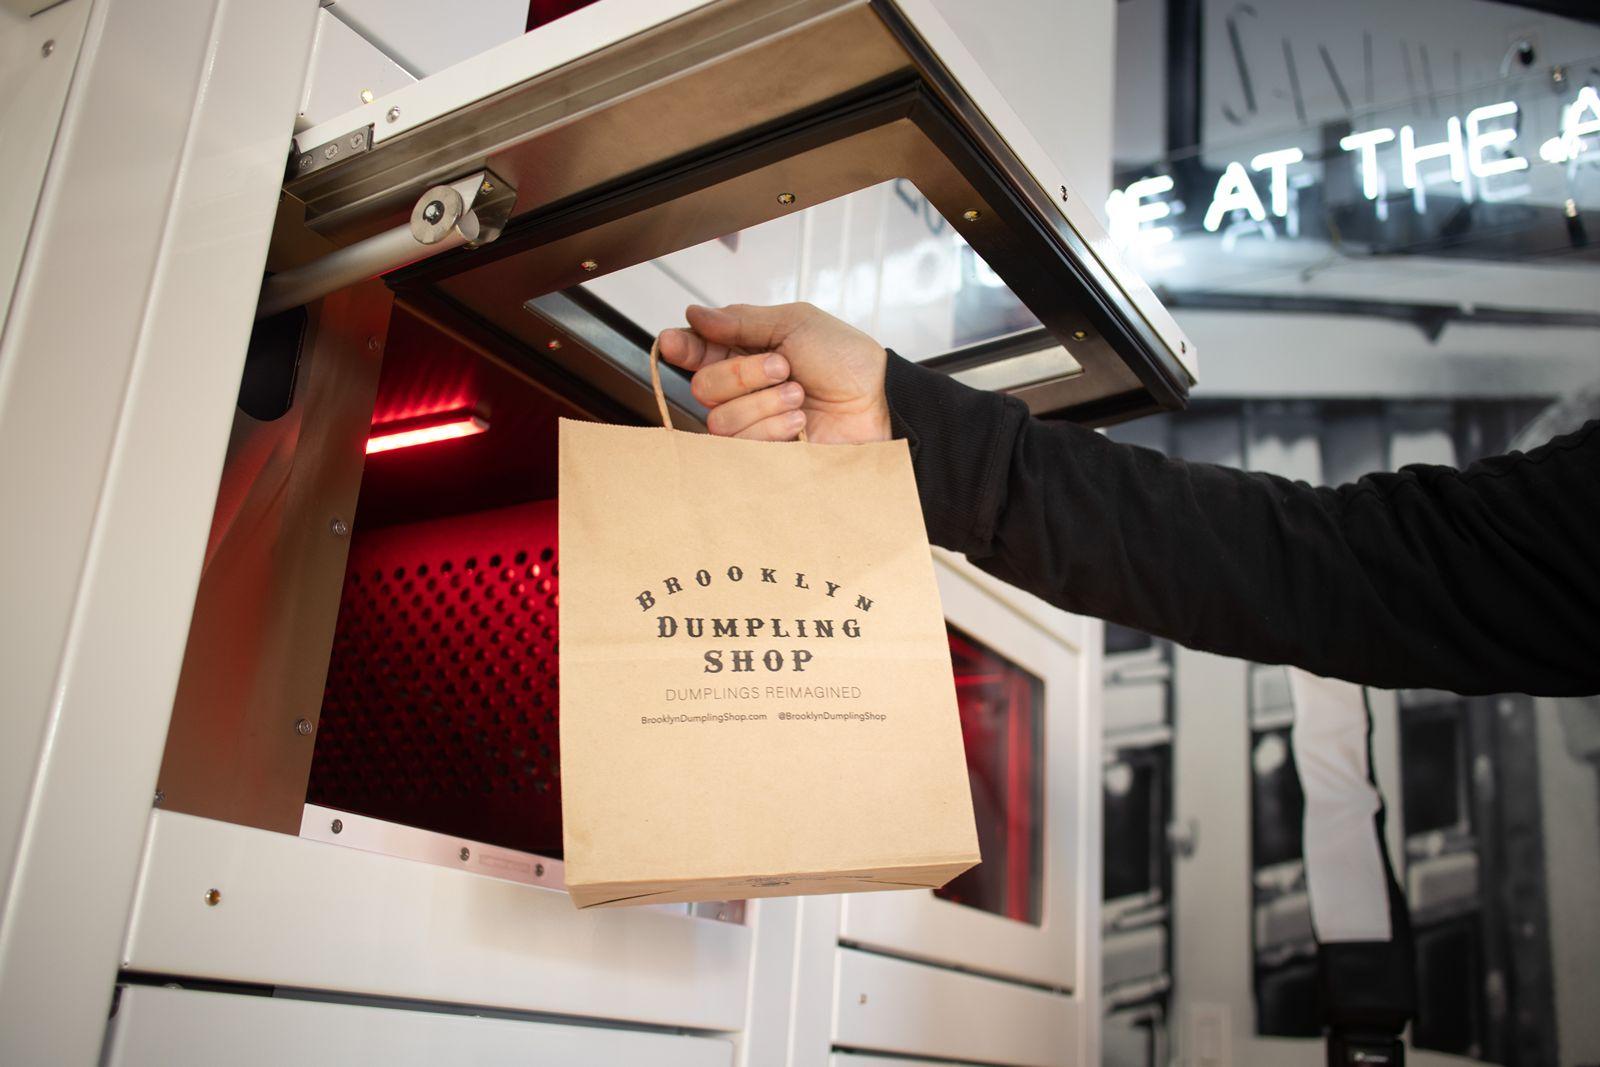 Brooklyn Dumpling Shop Inks Deal To Bring Six New Locations to Brooklyn